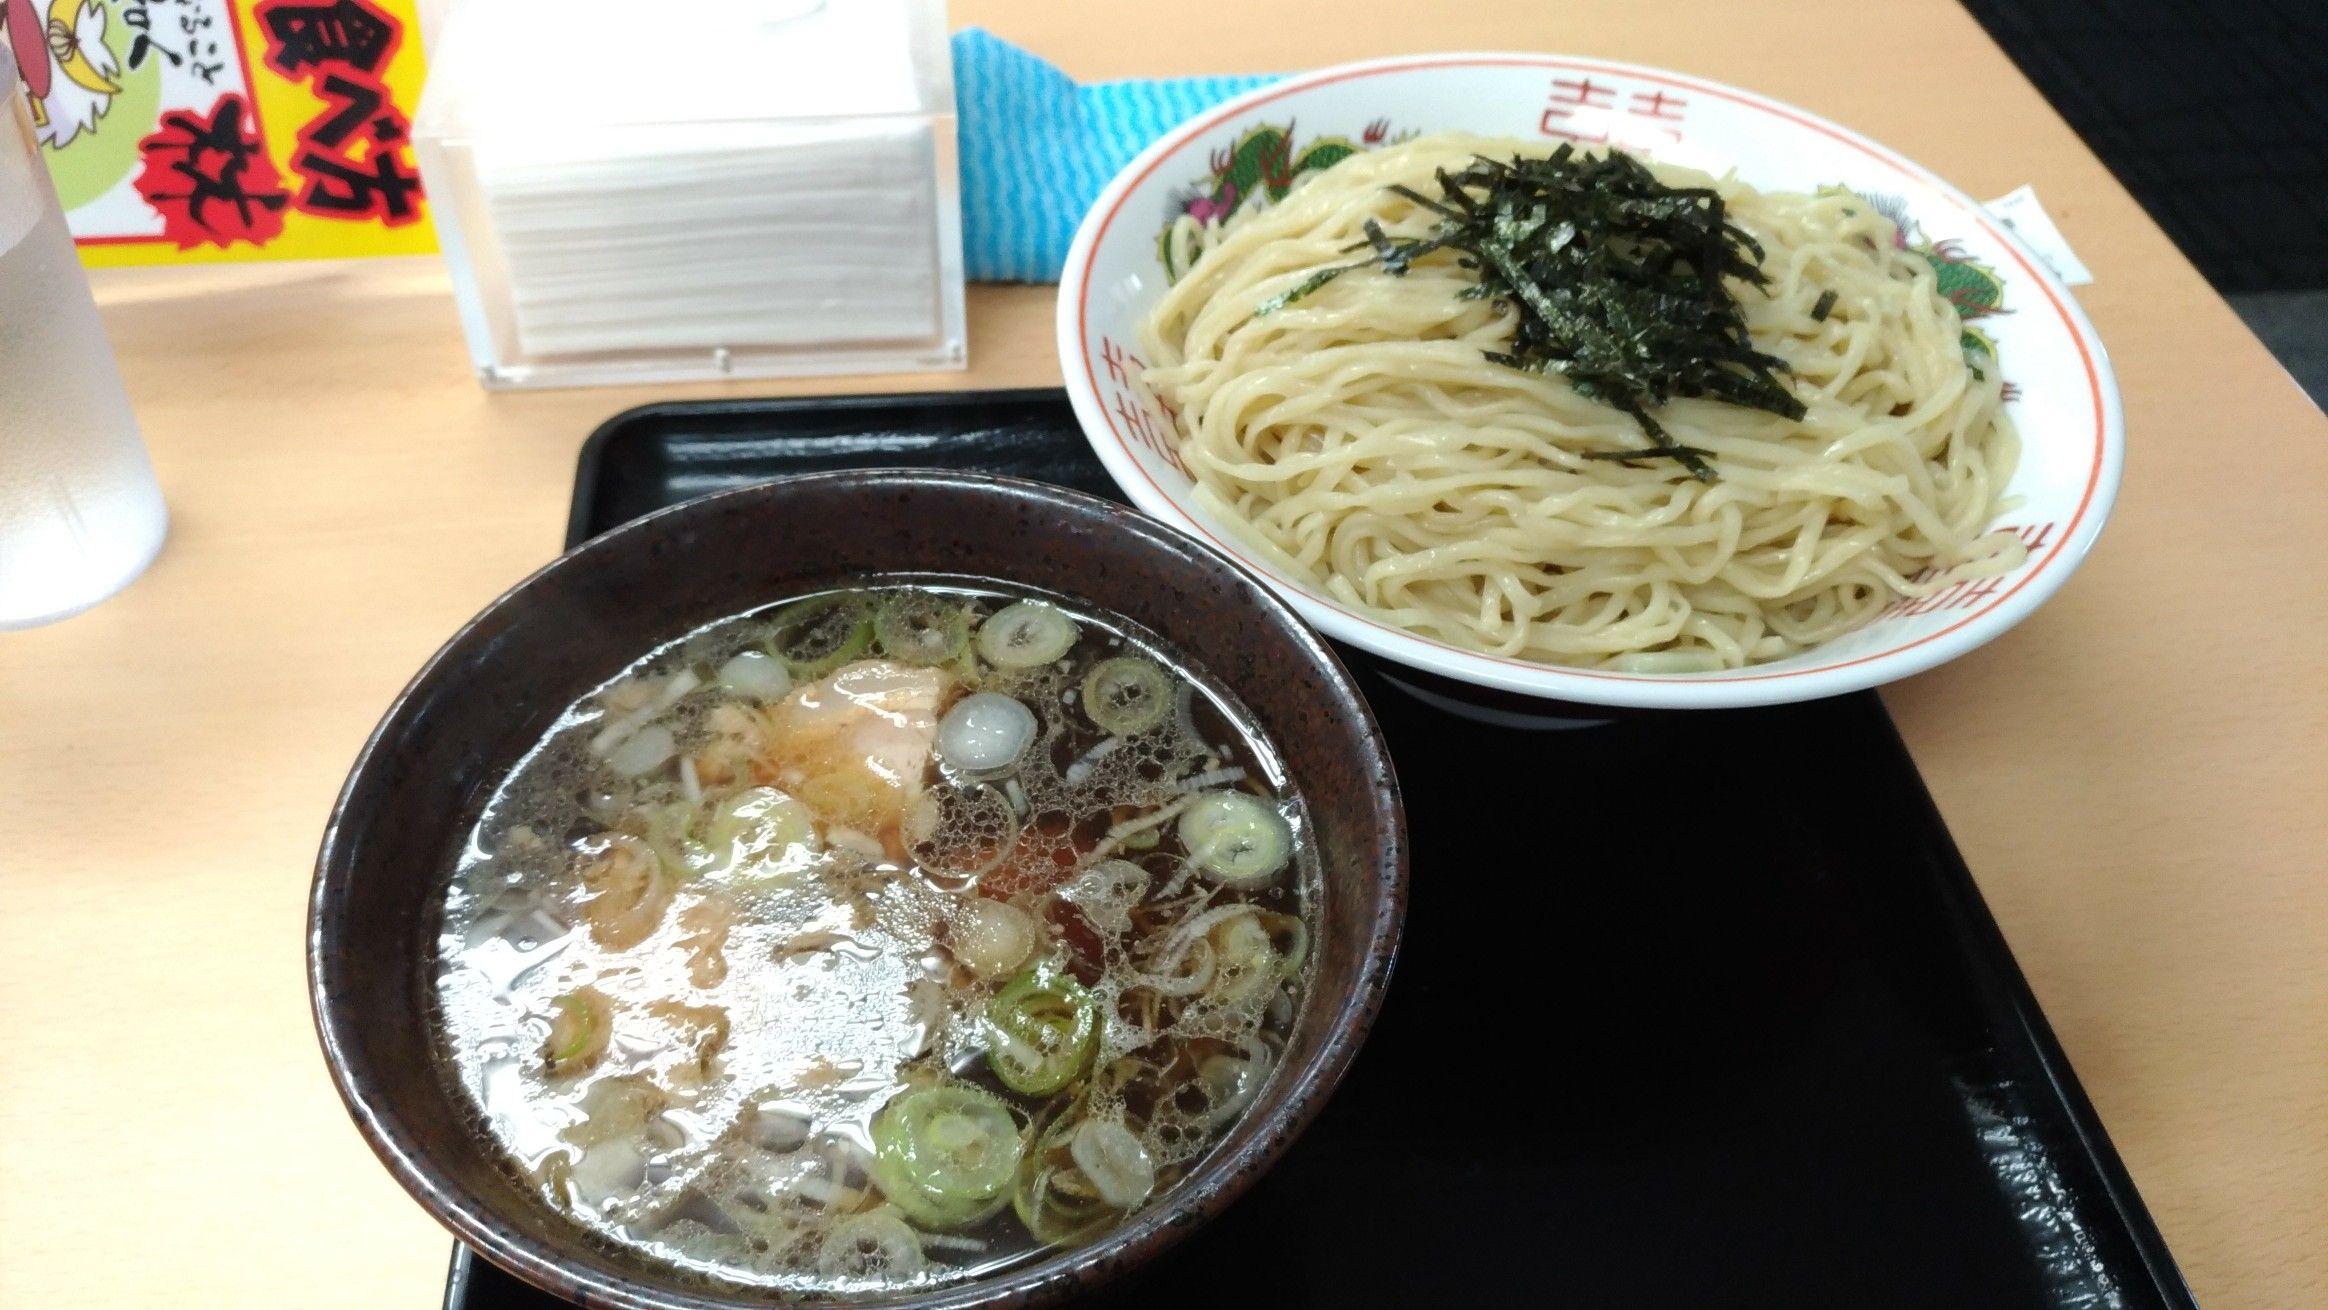 風林火山酒田店 酒田市 つけ中華 | Noodle | 中華